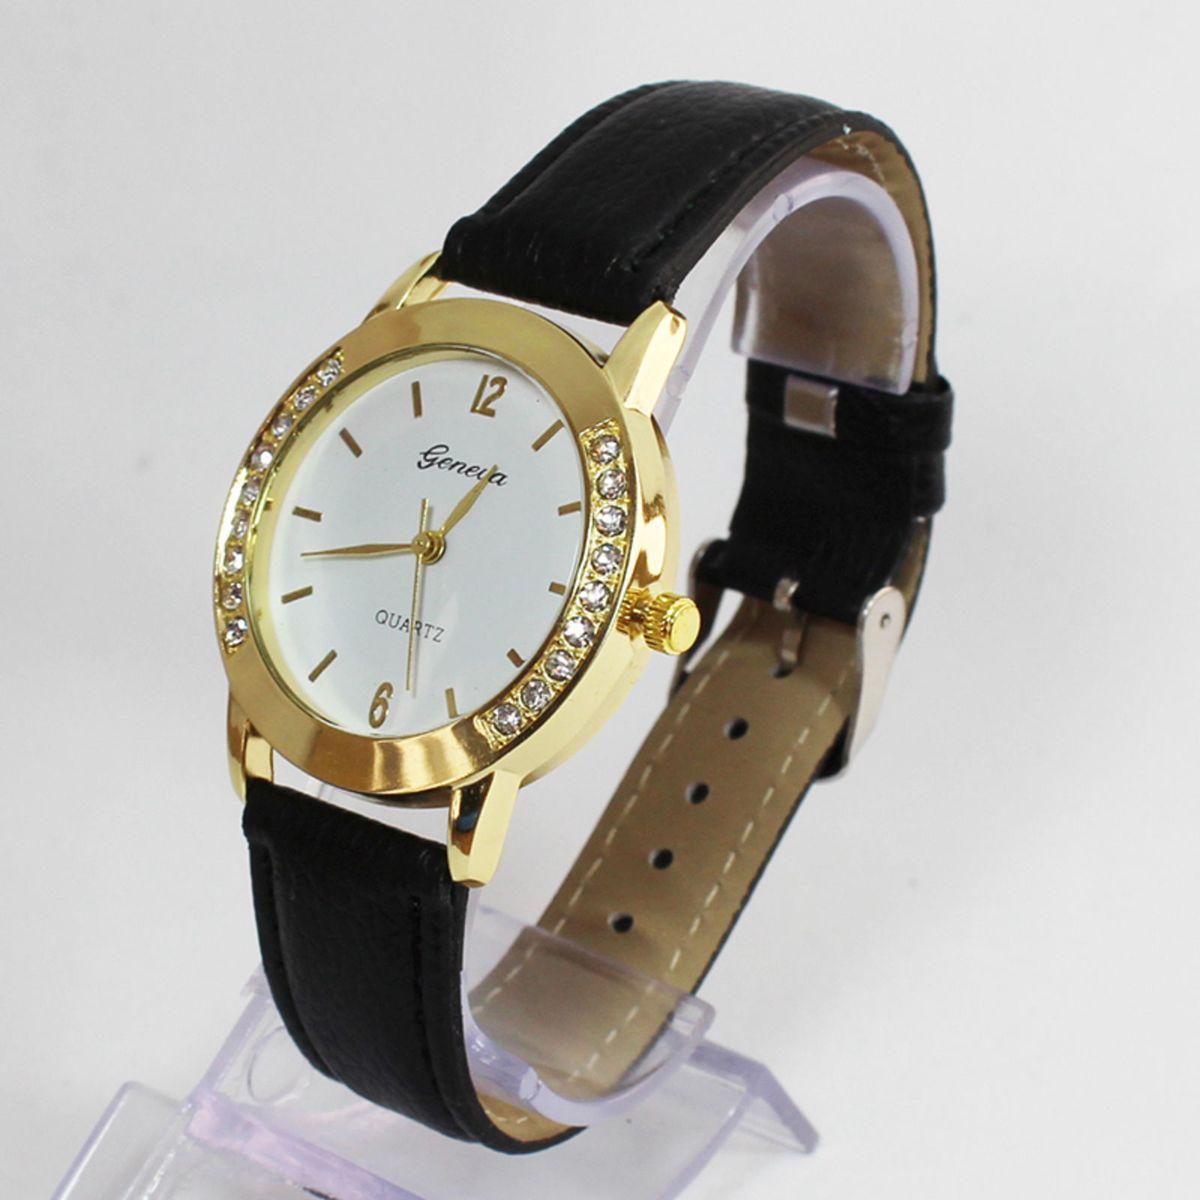 42b0dd3576b Relógio Feminino Preto Couro Strass Clássico